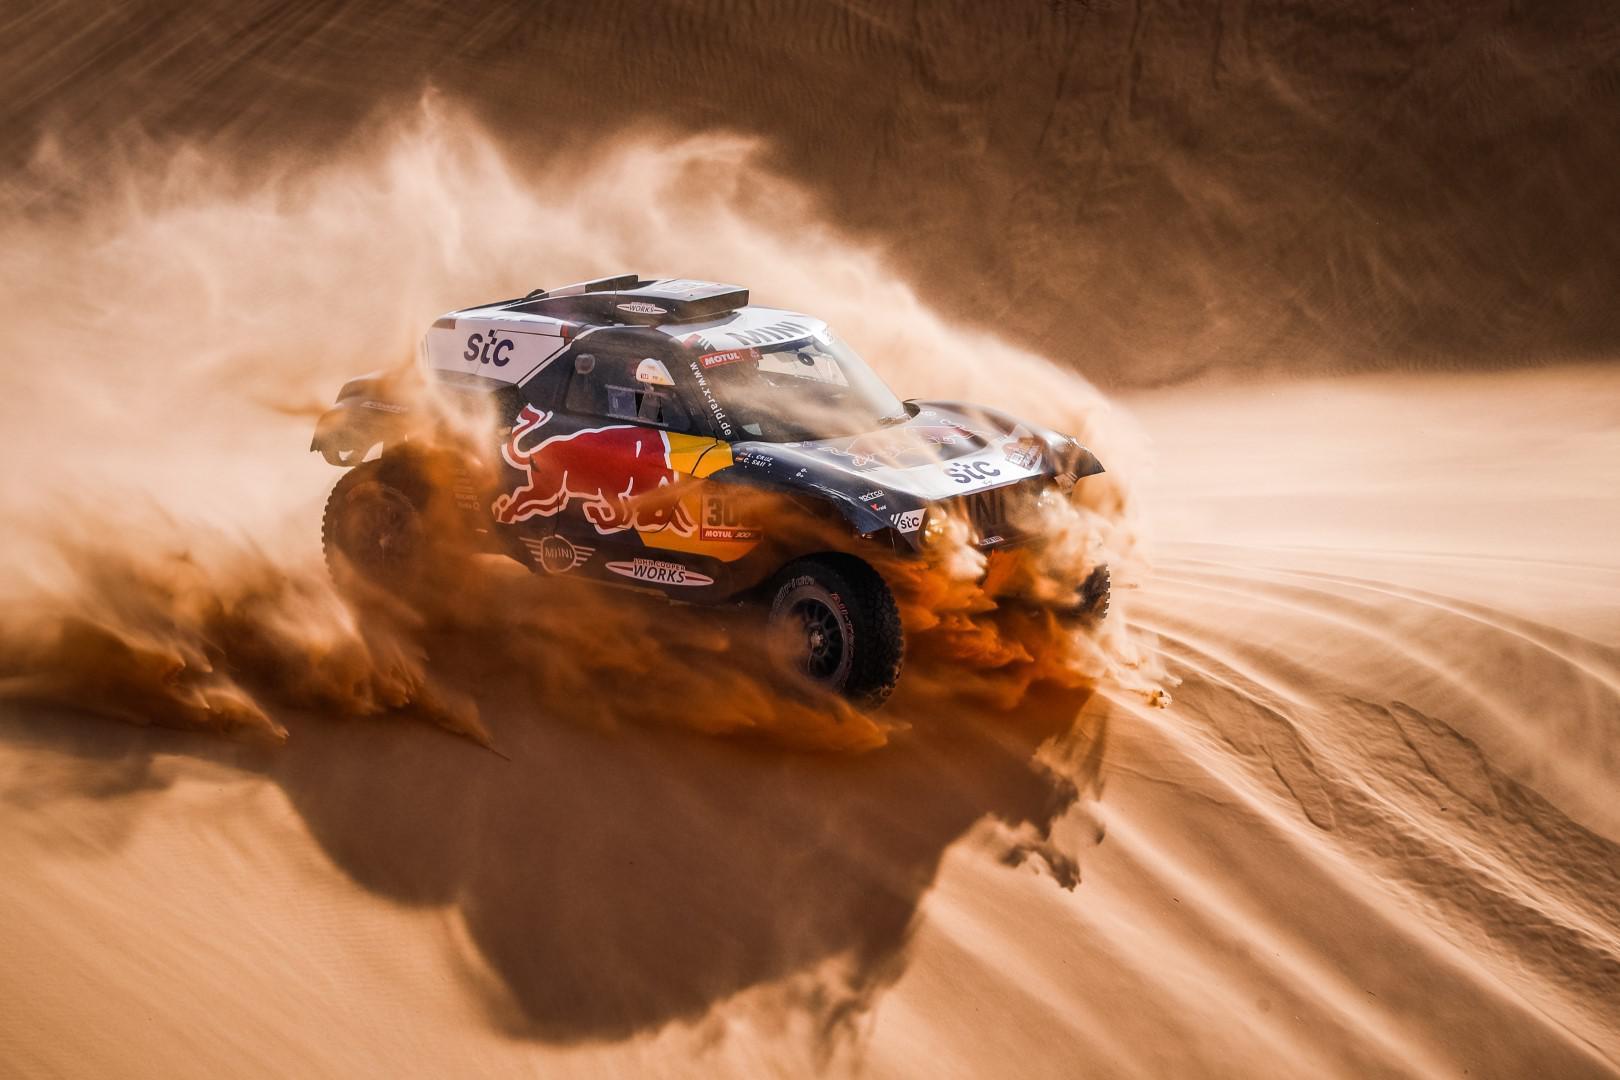 rally-dakar-2021-6eme-victoire-au-general-pour-mini-1416-3.jpg